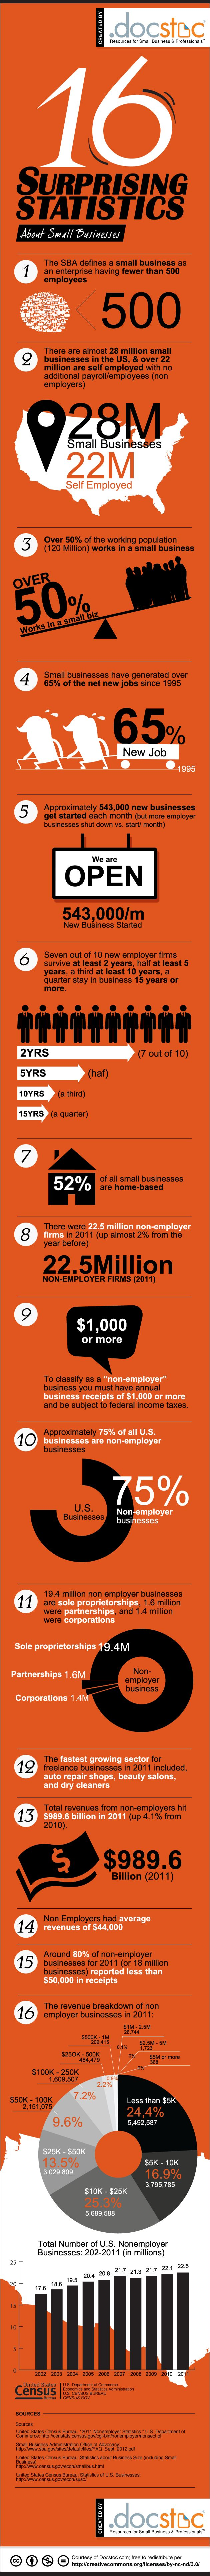 16 Surprising Small Business Statistics